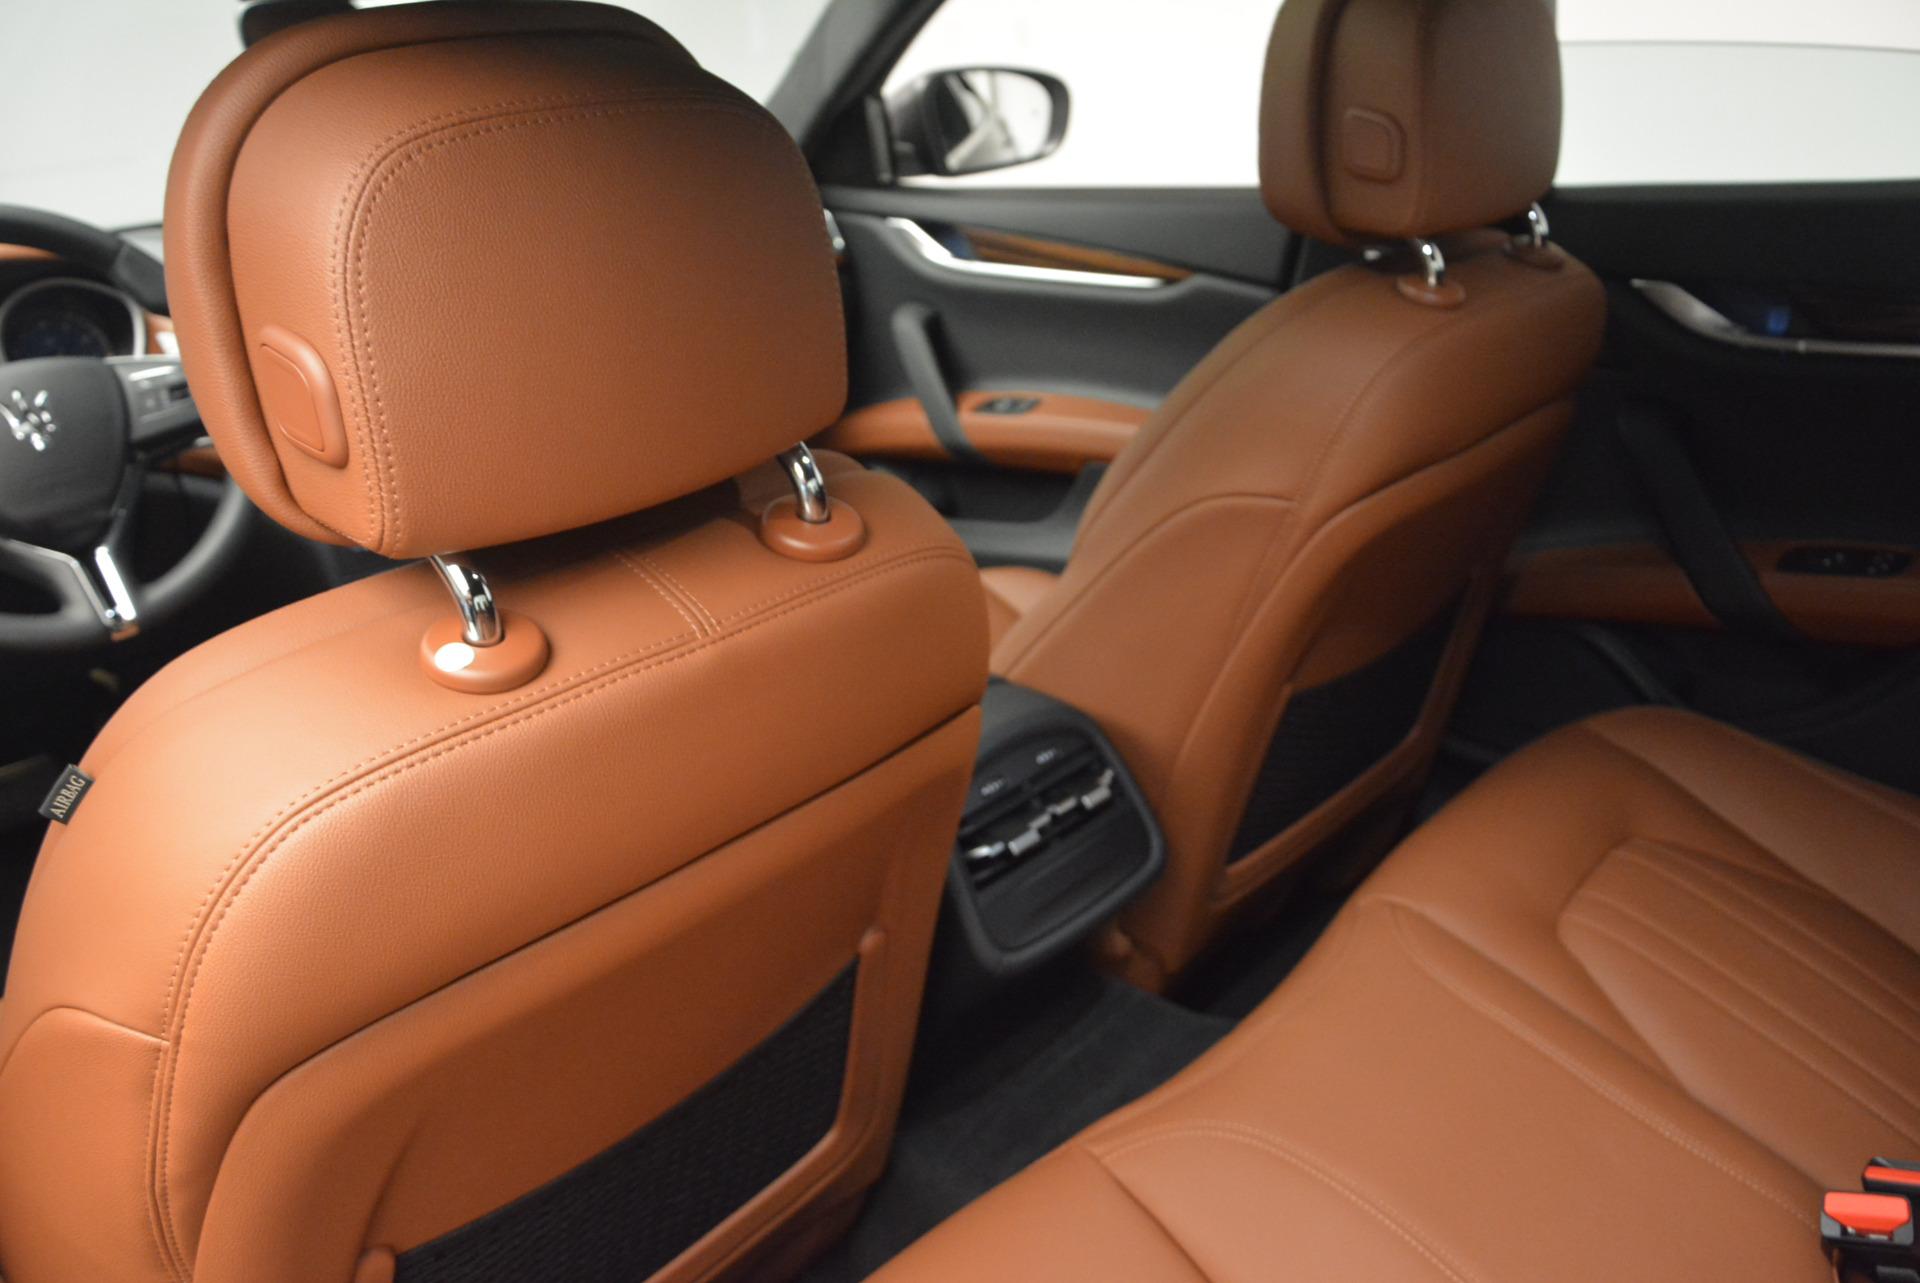 Used 2017 Maserati Ghibli S Q4  EX-LOANER For Sale In Greenwich, CT. Alfa Romeo of Greenwich, W311 565_p16